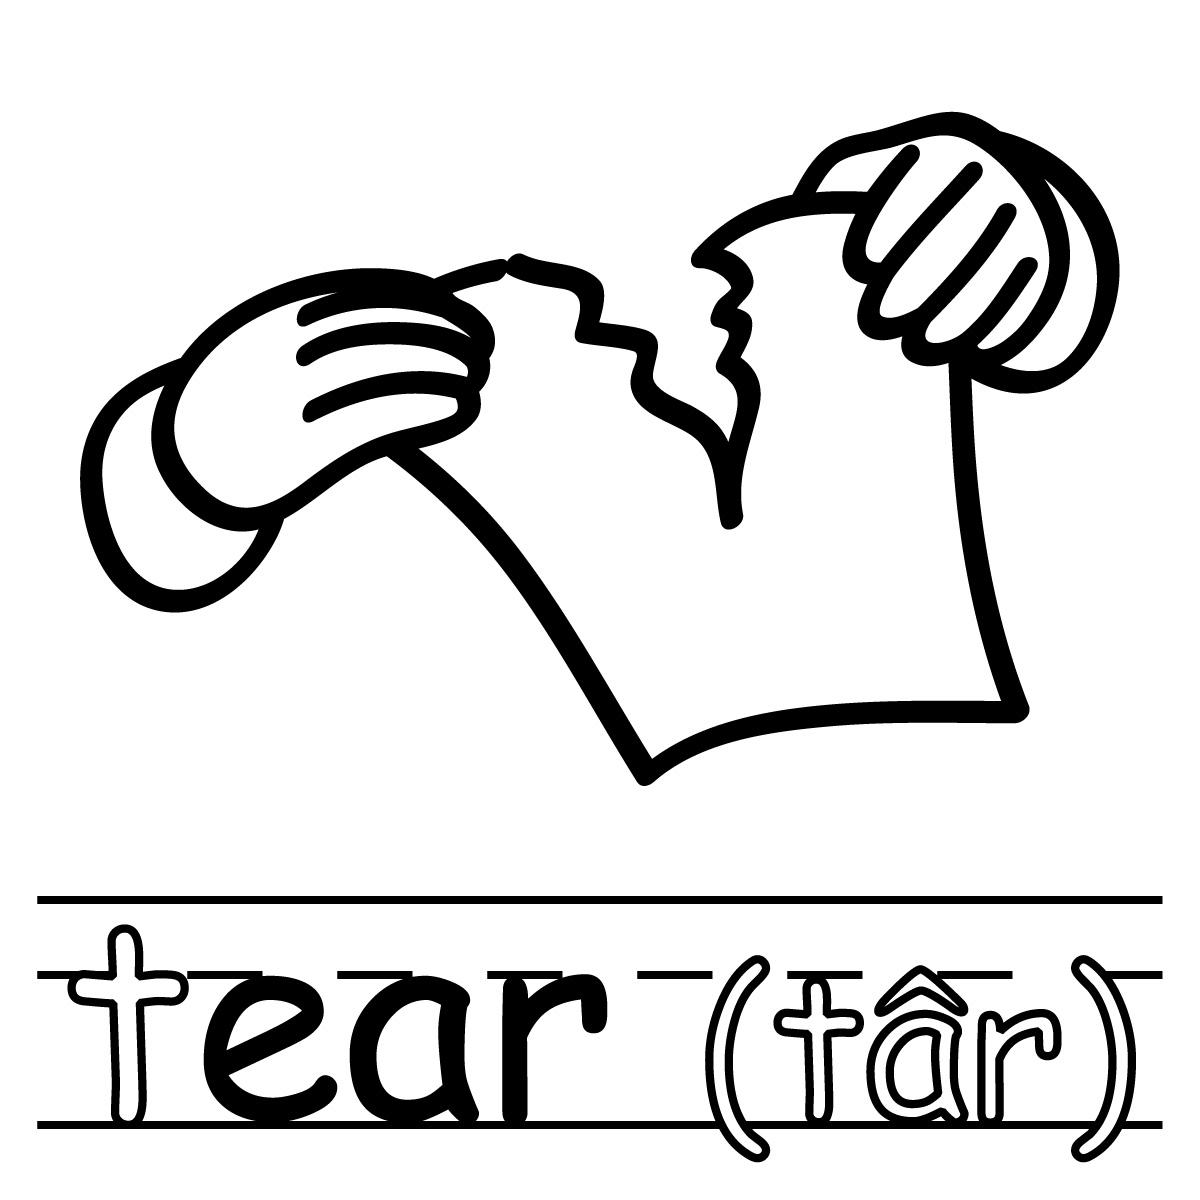 Free Tear Cliparts Download Free Clip Art Free Clip Art